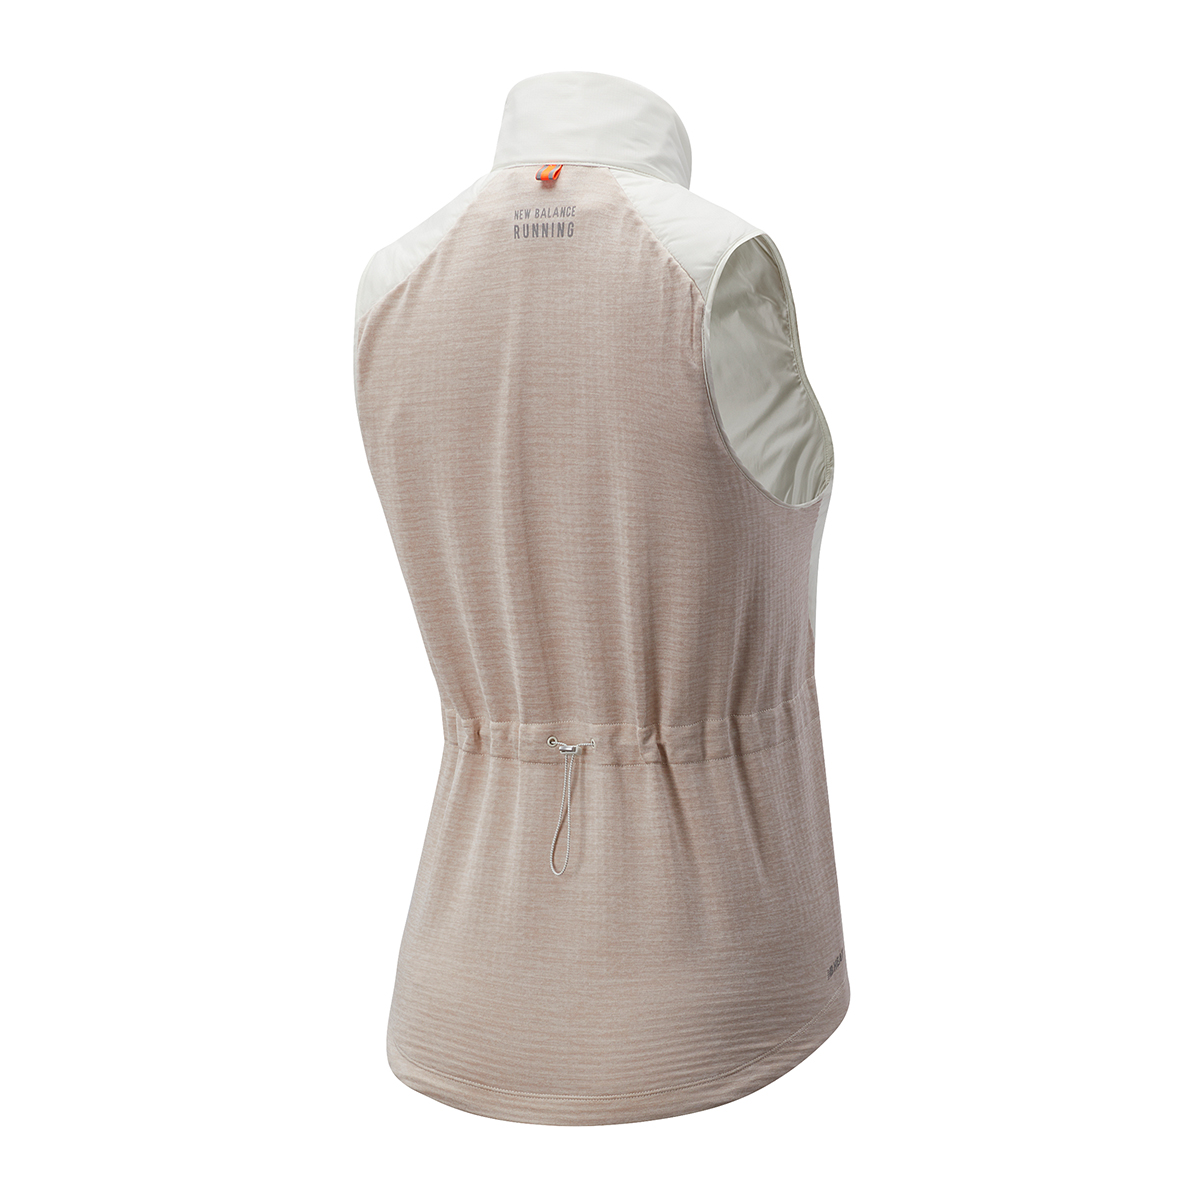 Women's New Balance Heat Grid Vest - Color: Sea Salt Heather - Size: L, Sea Salt Heather, large, image 2